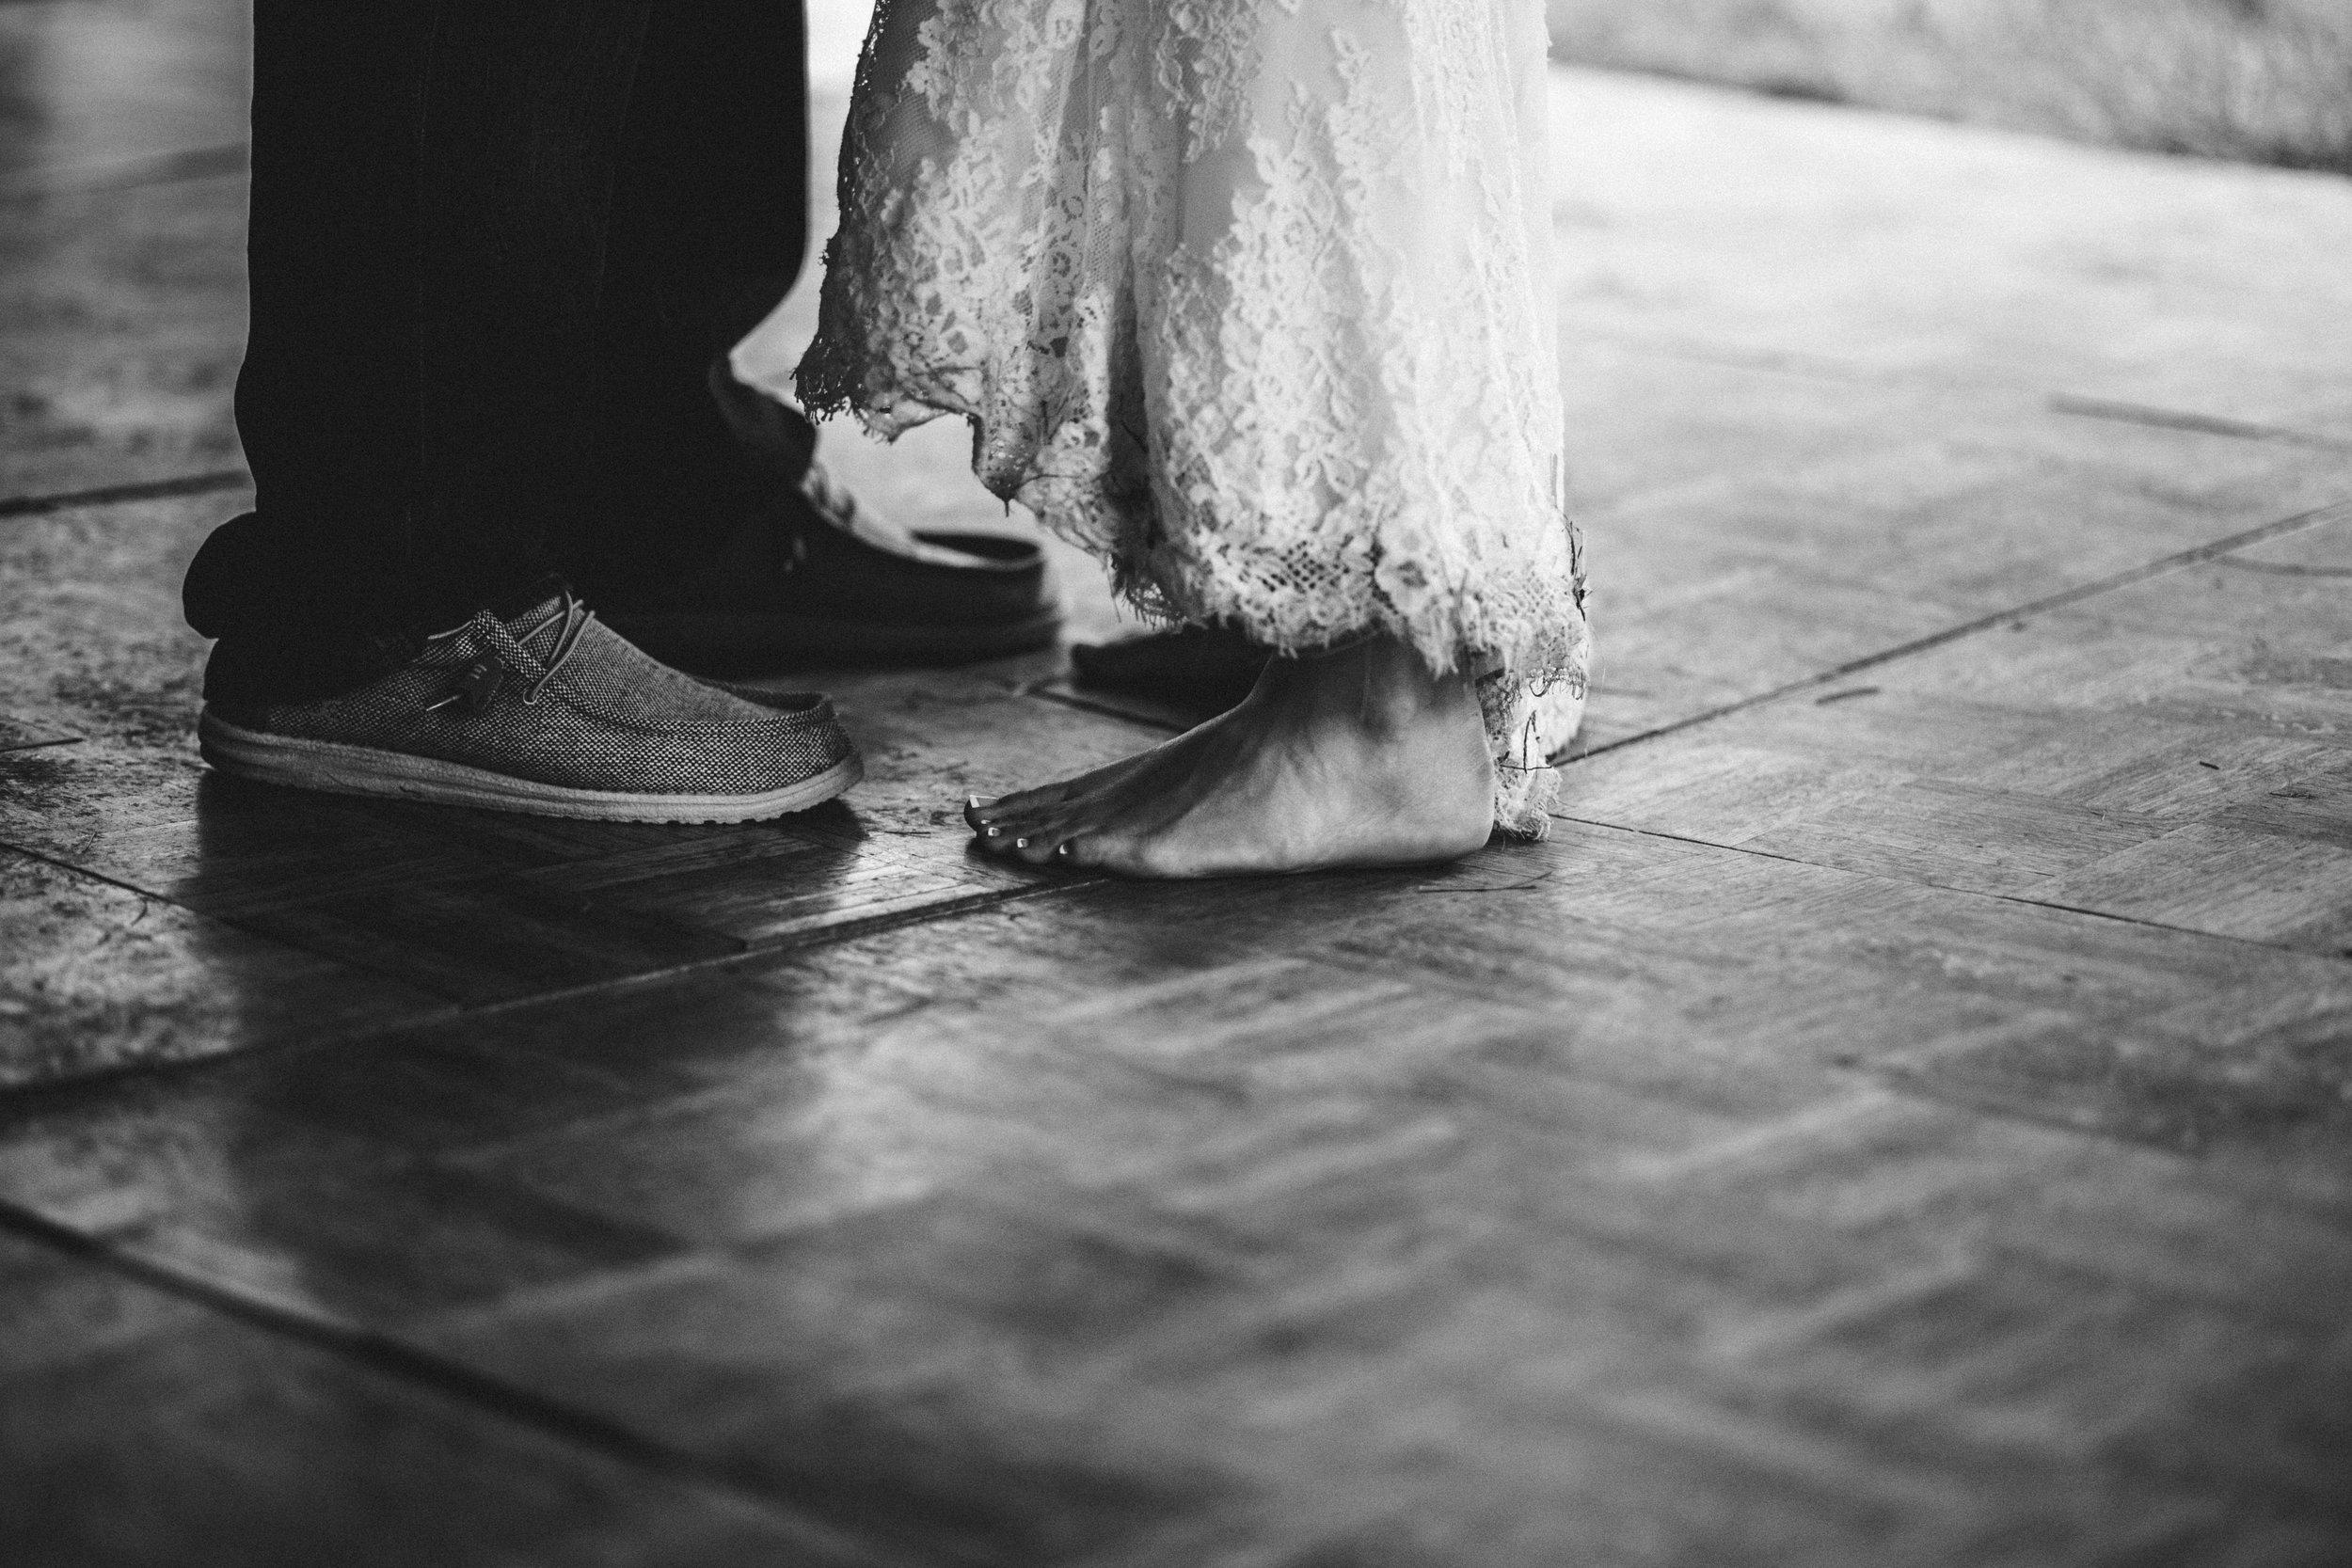 Bohemian Wedding - Sabrina Leigh Studios - Northern Michigan Wedding Photographer103.jpg